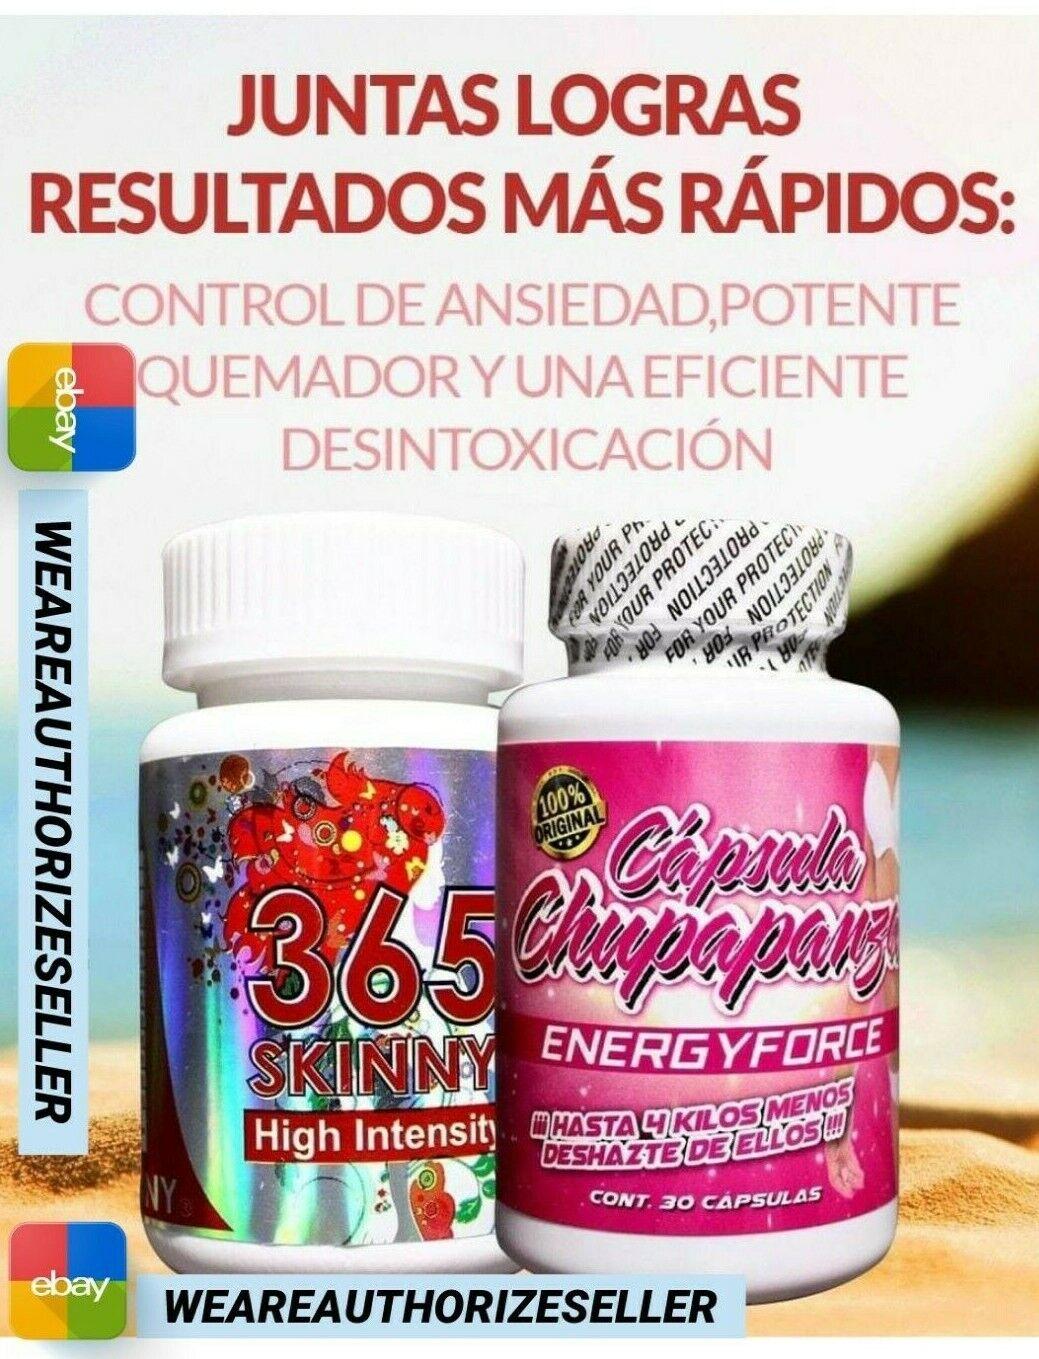 COMBO DE 365 SKINNY HIGH INTENSITY Y CHUPA PANZA ENERGYFORCE